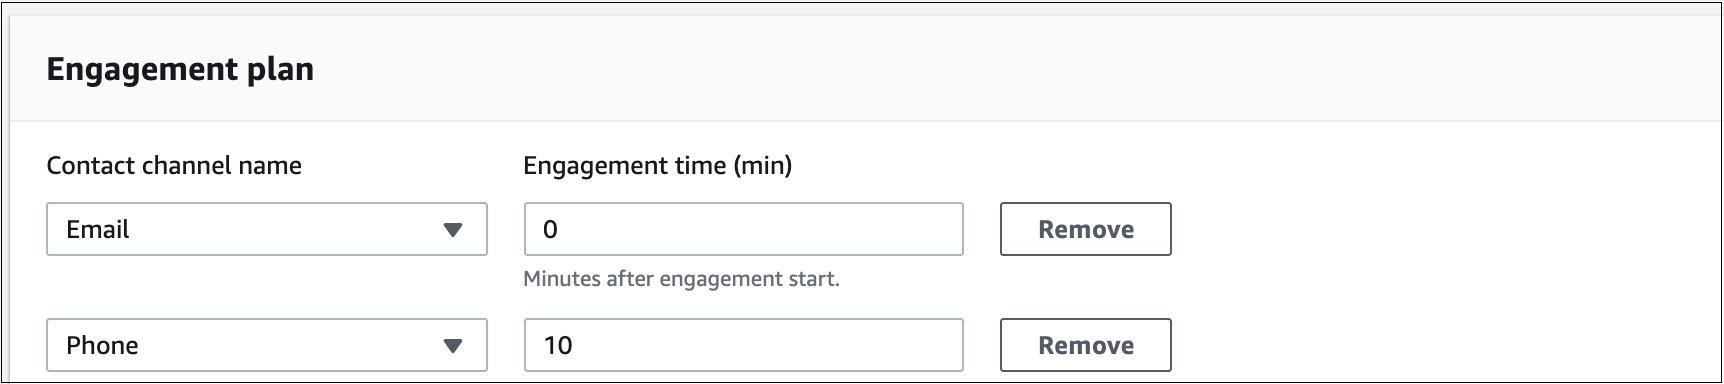 Figure 2: Engagement plan